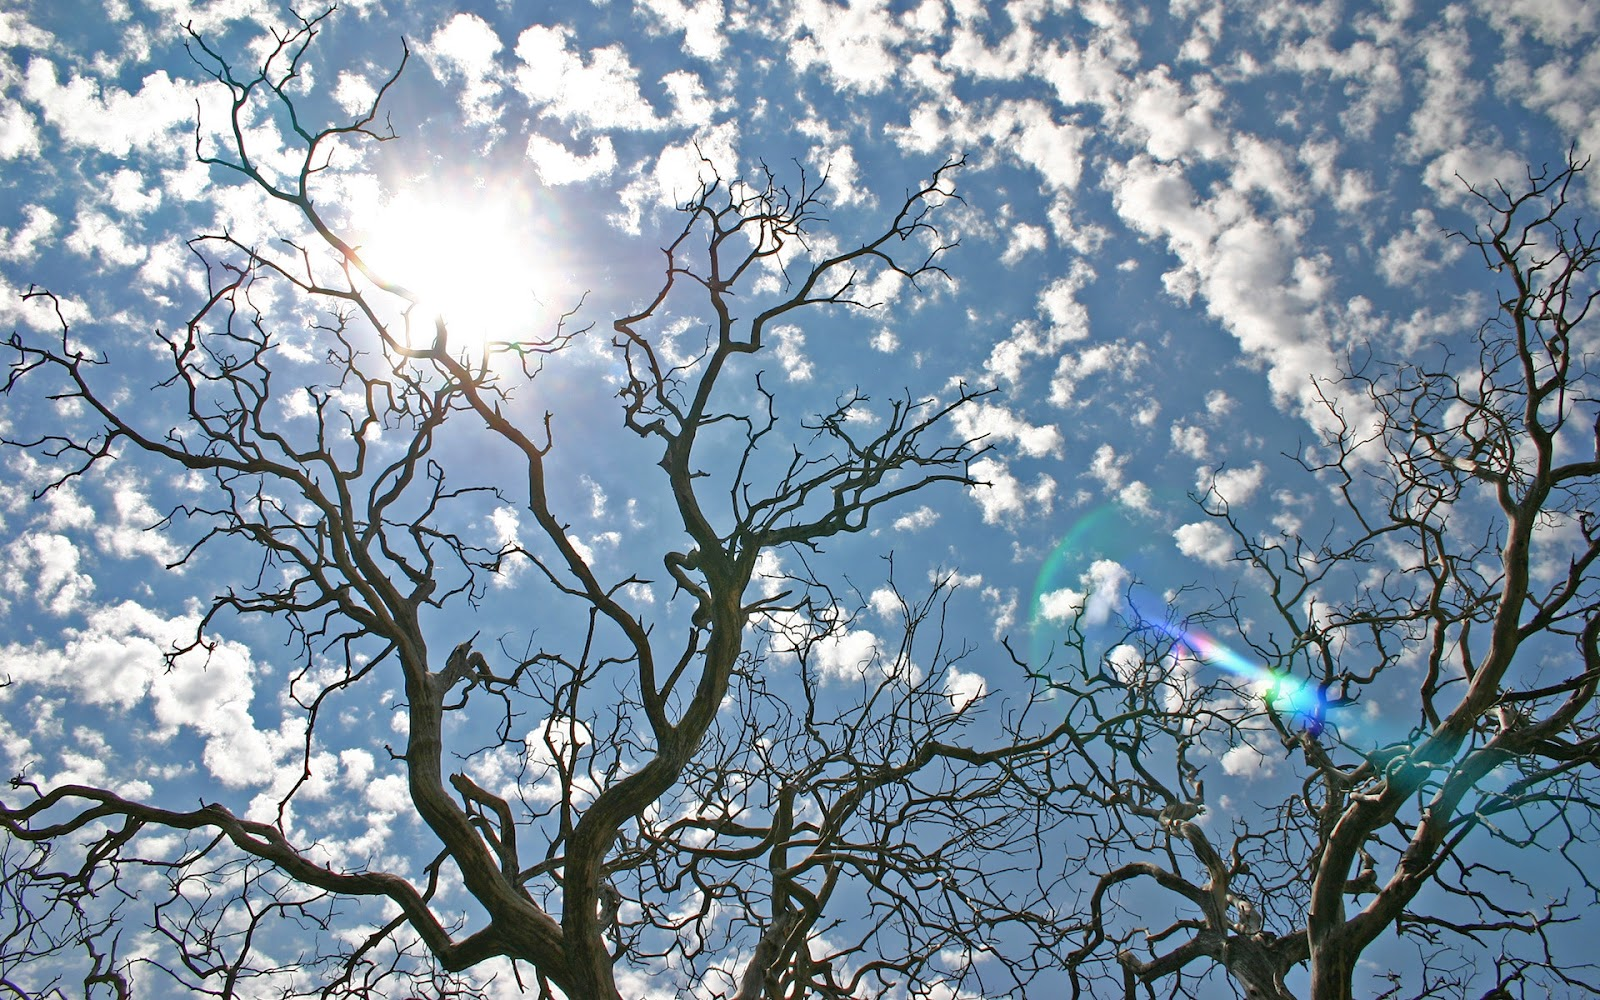 Compartiendo fondos fondos de pantalla paisajes naturales for Fondo de pantalla chulo